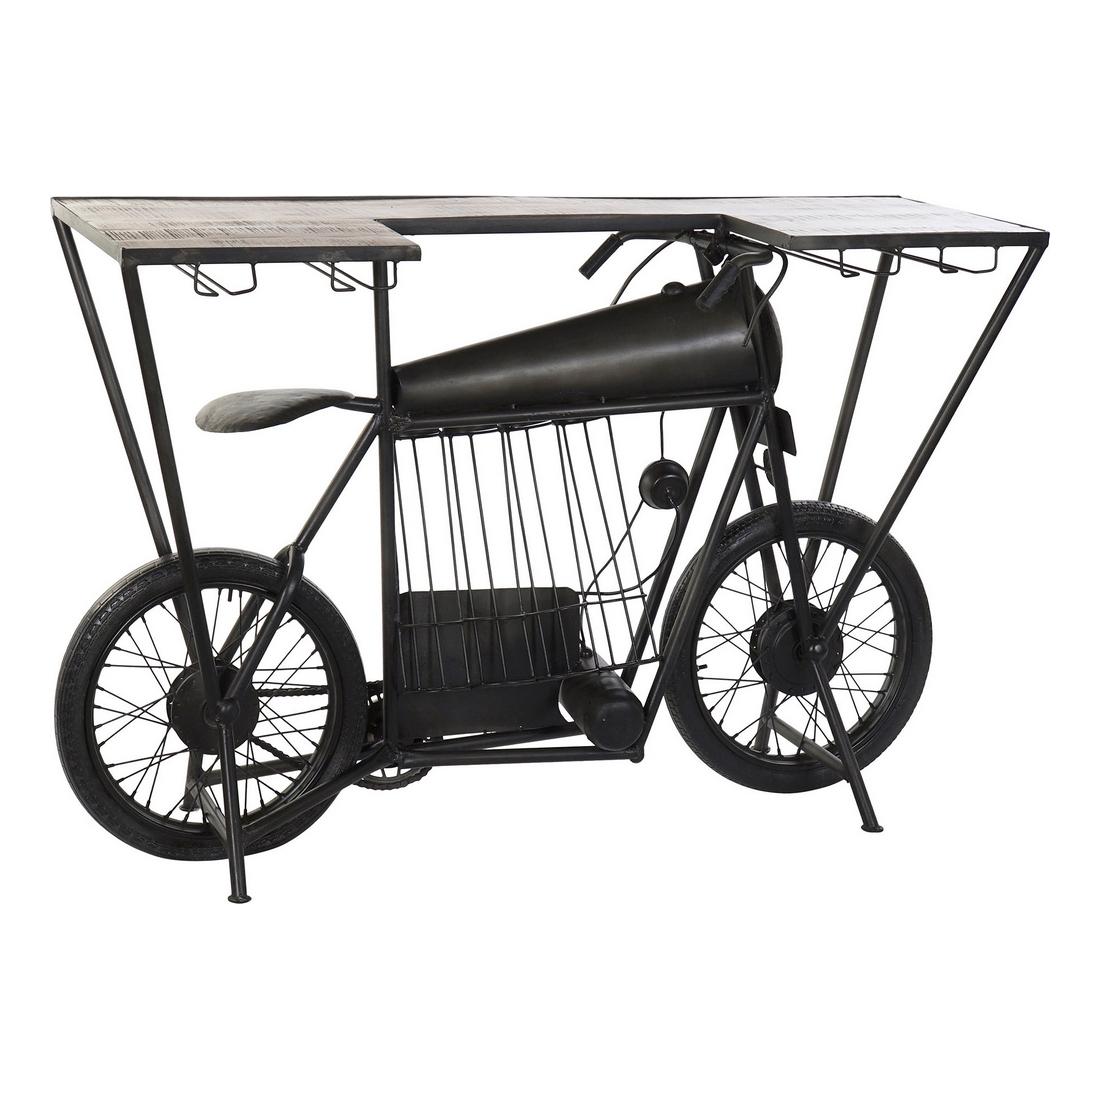 Bottle rack DKD Home Decor Motorbike Iron Acacia (157 x 51 x 100 cm)